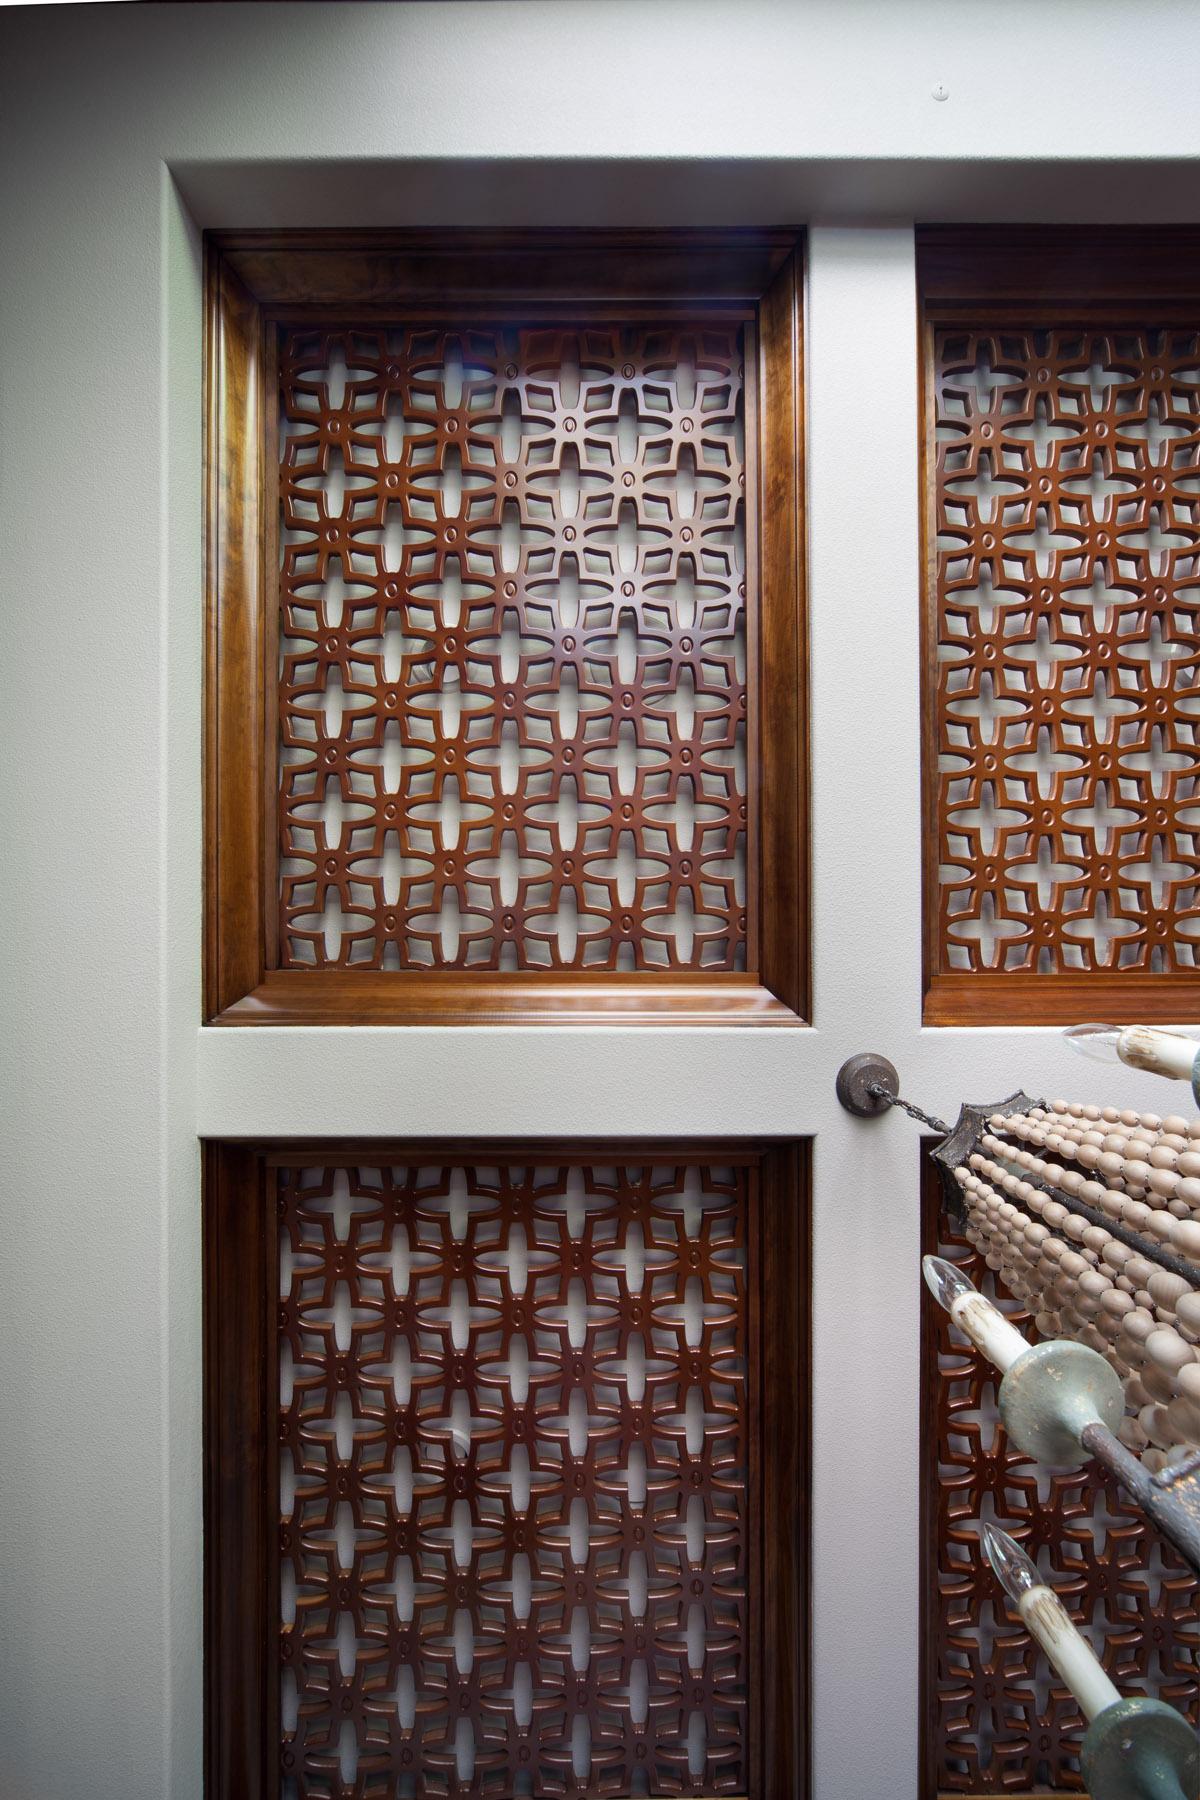 ornate wooden ceiling design built by Einheit Homes